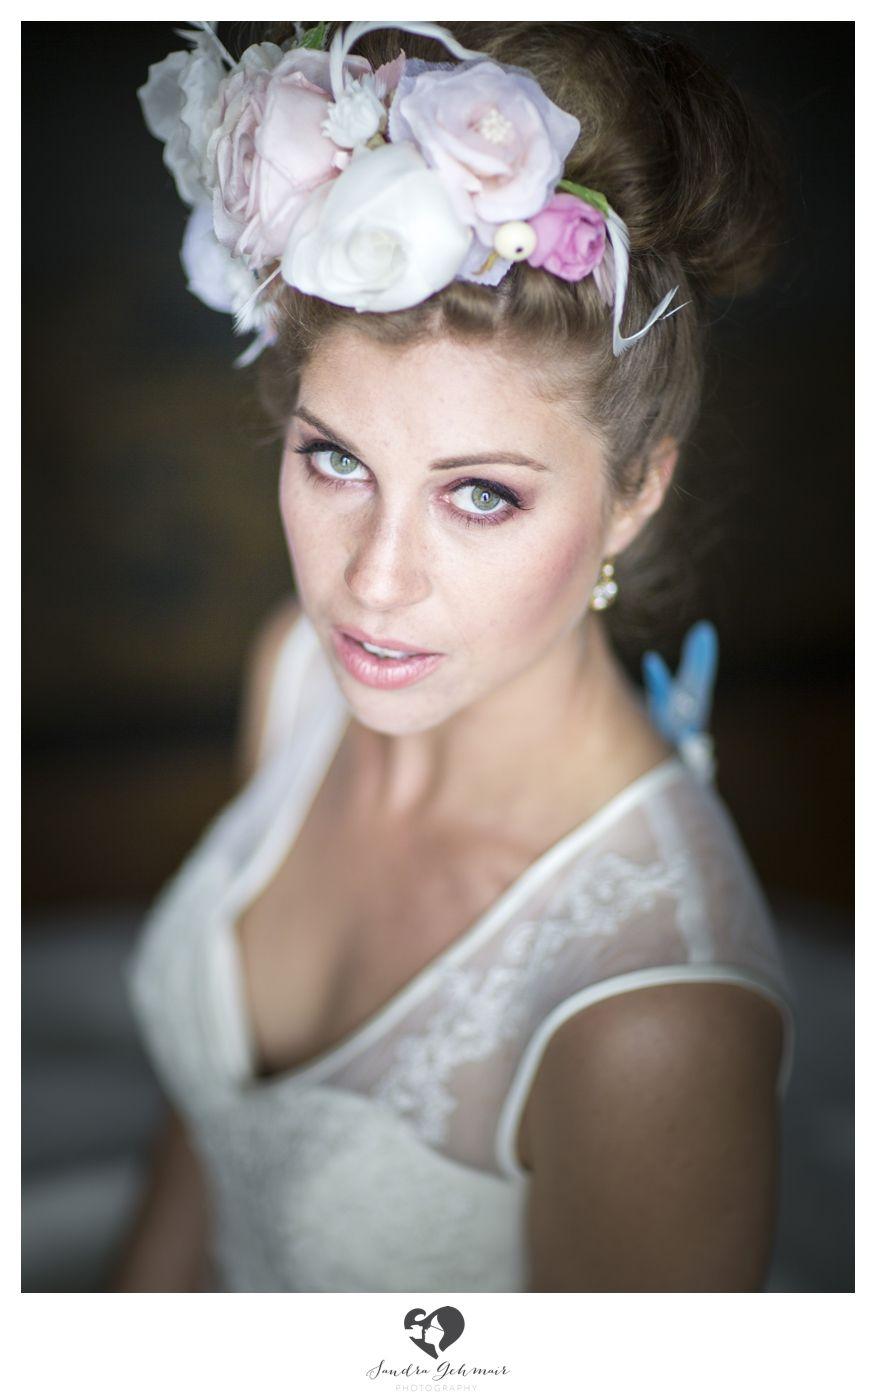 #makeup #beauty #eyemakeup #eyes #augen #cute #perfect #emotions #soft #smokeyeye #verrucht #schminke #wedding #hochzeit